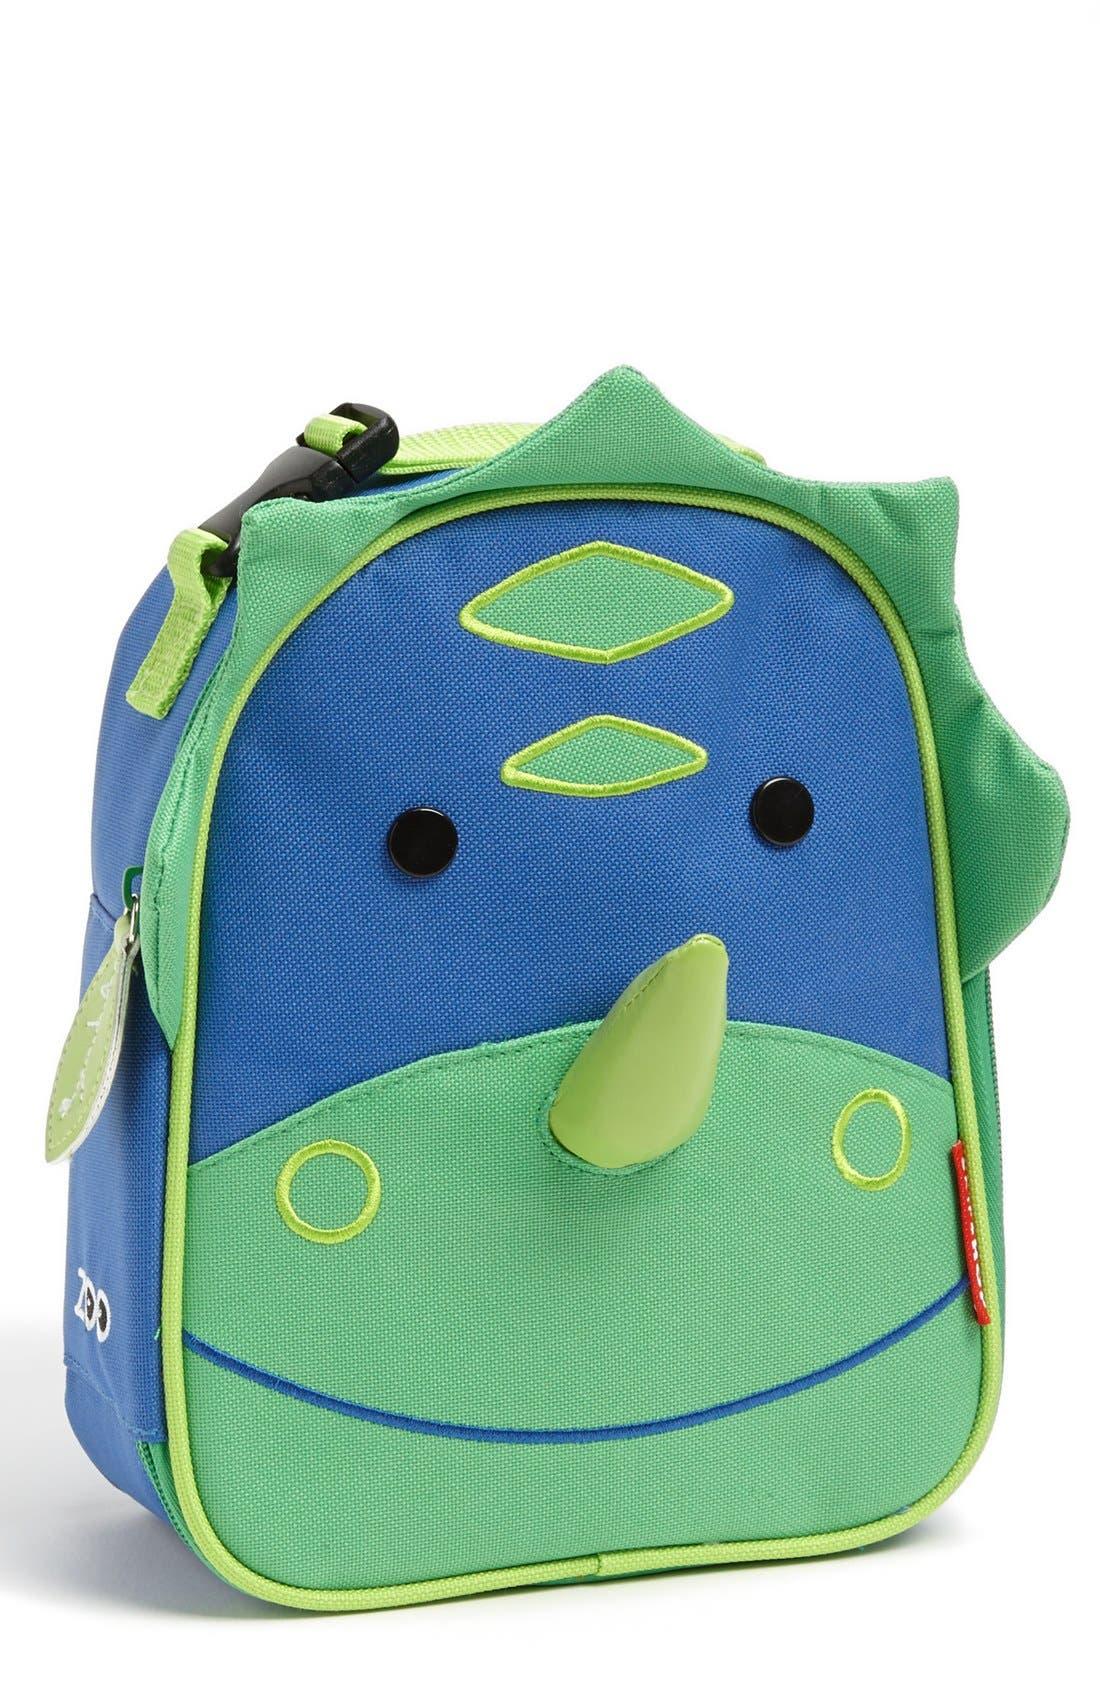 Zoo Lunch Bag,                             Main thumbnail 1, color,                             BLUE